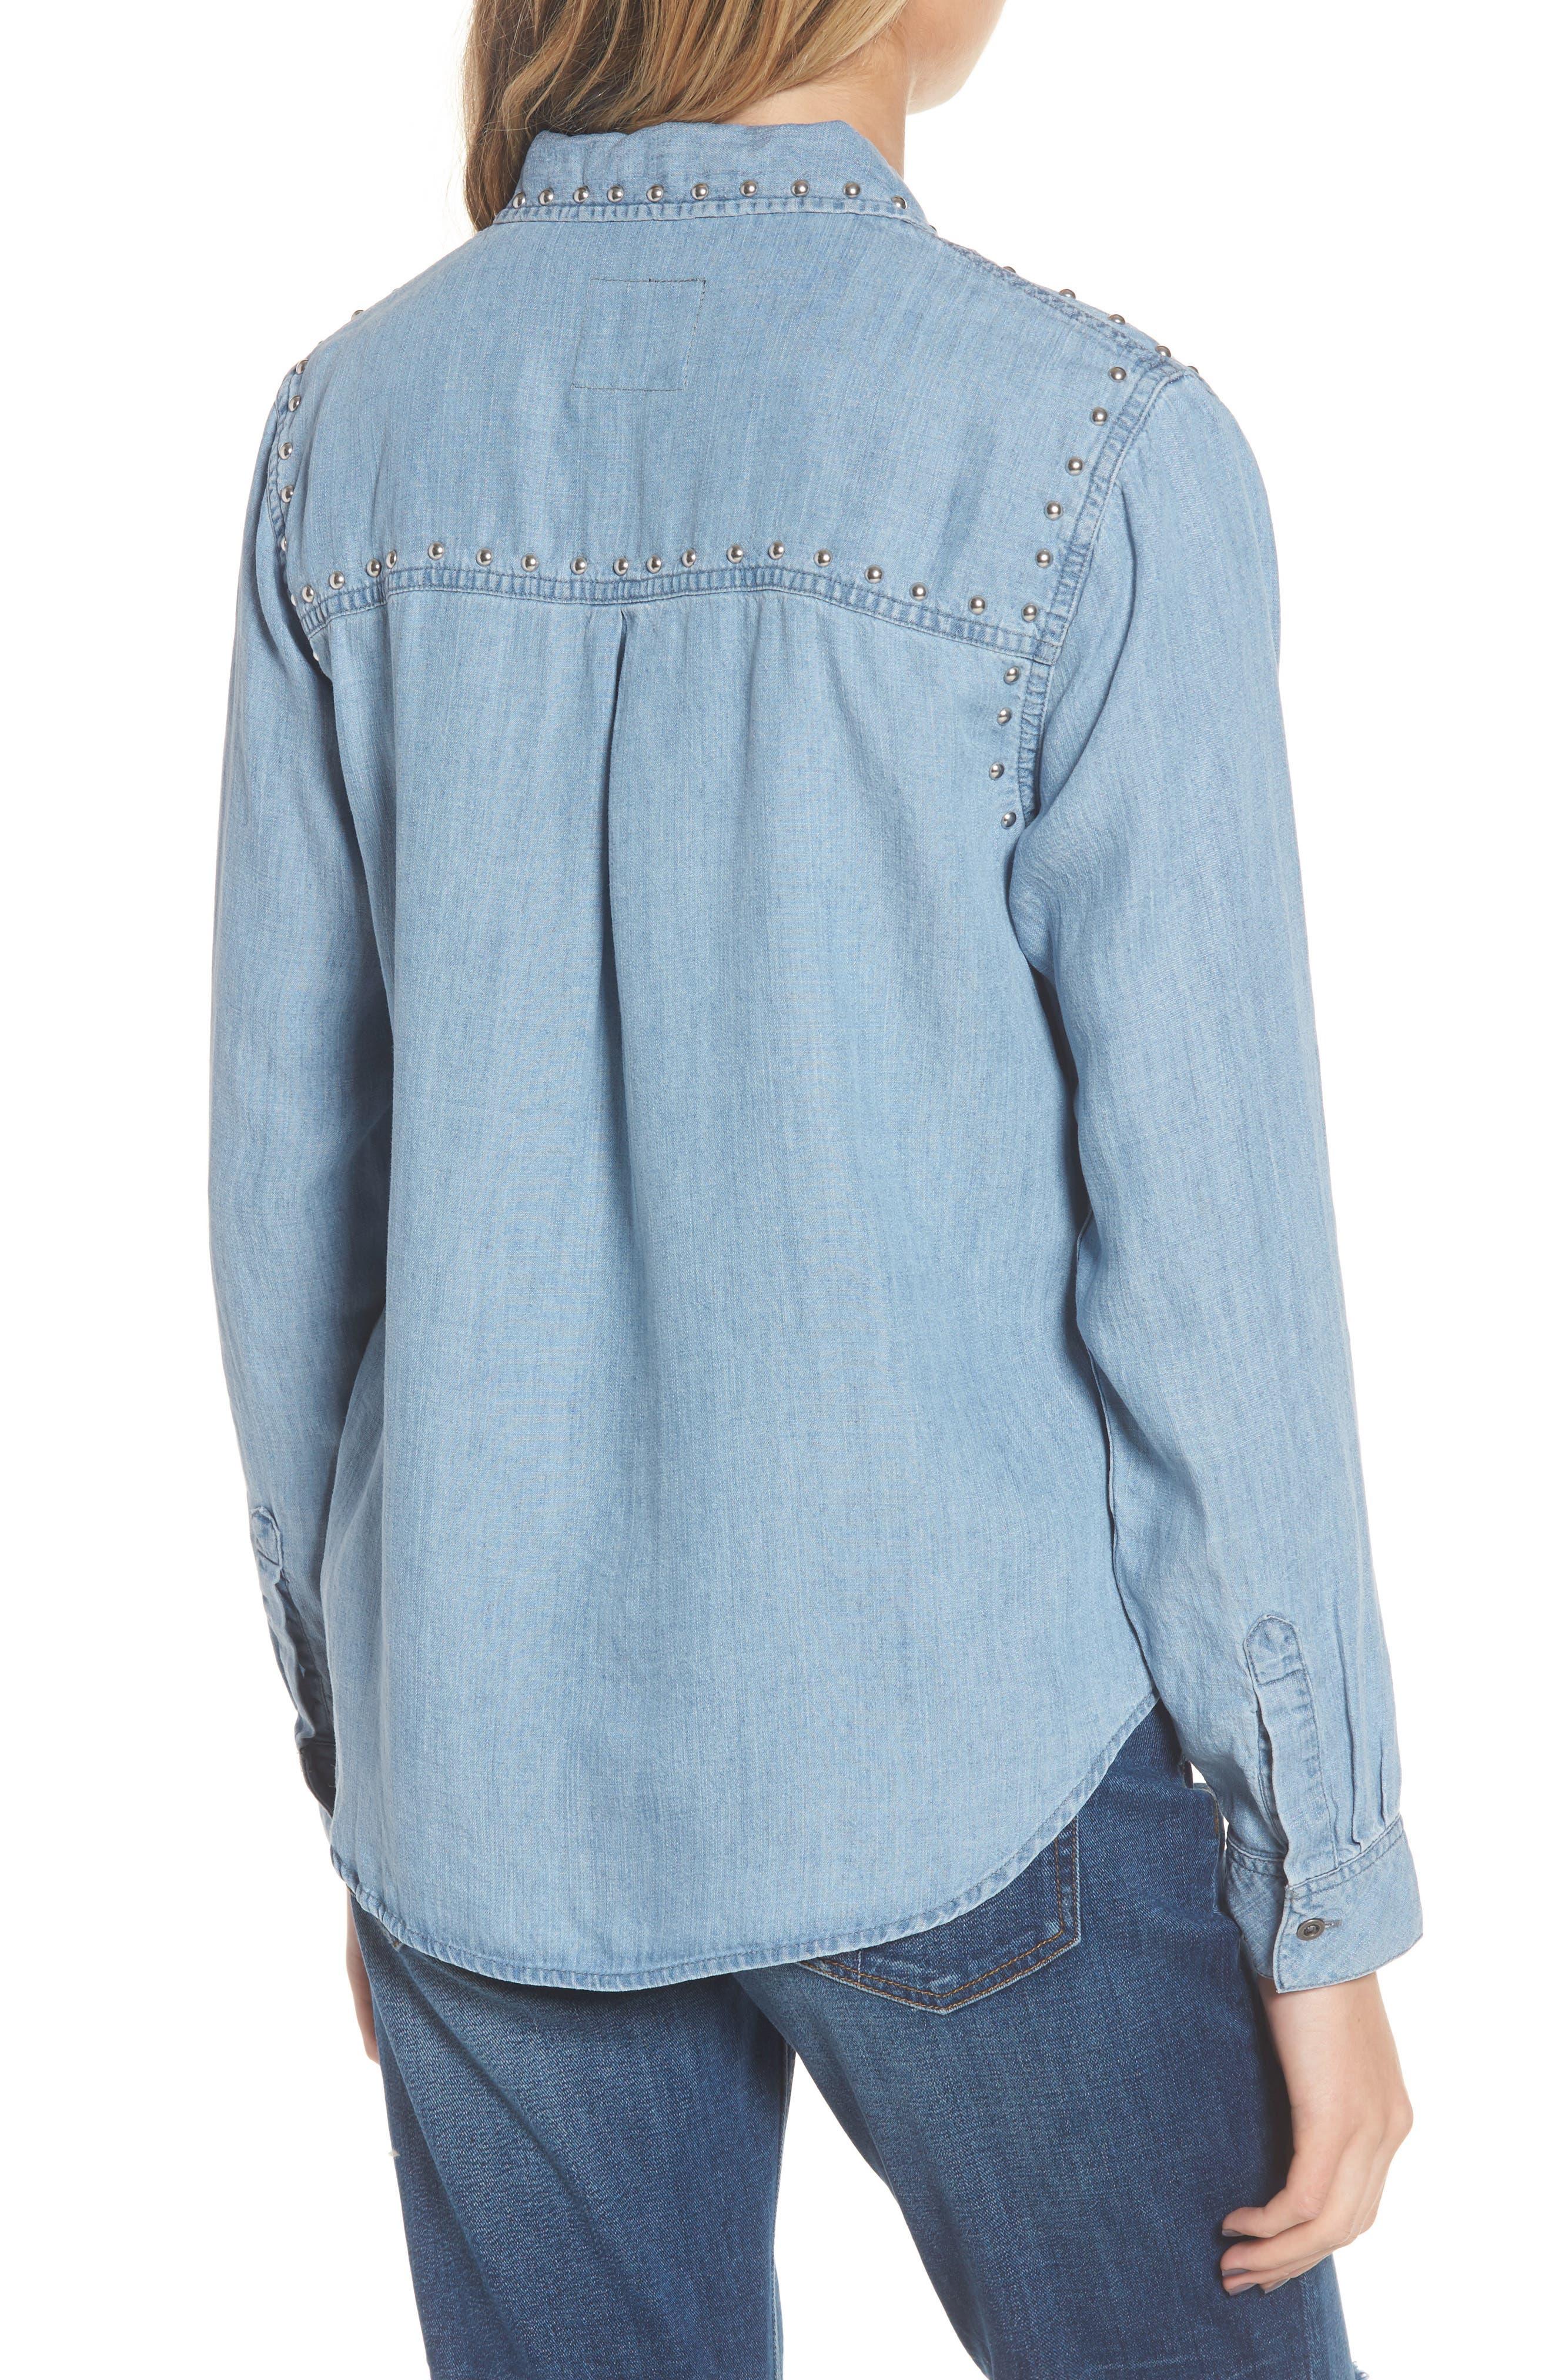 Alternate Image 3  - Rails Ingrid Studded Shirt